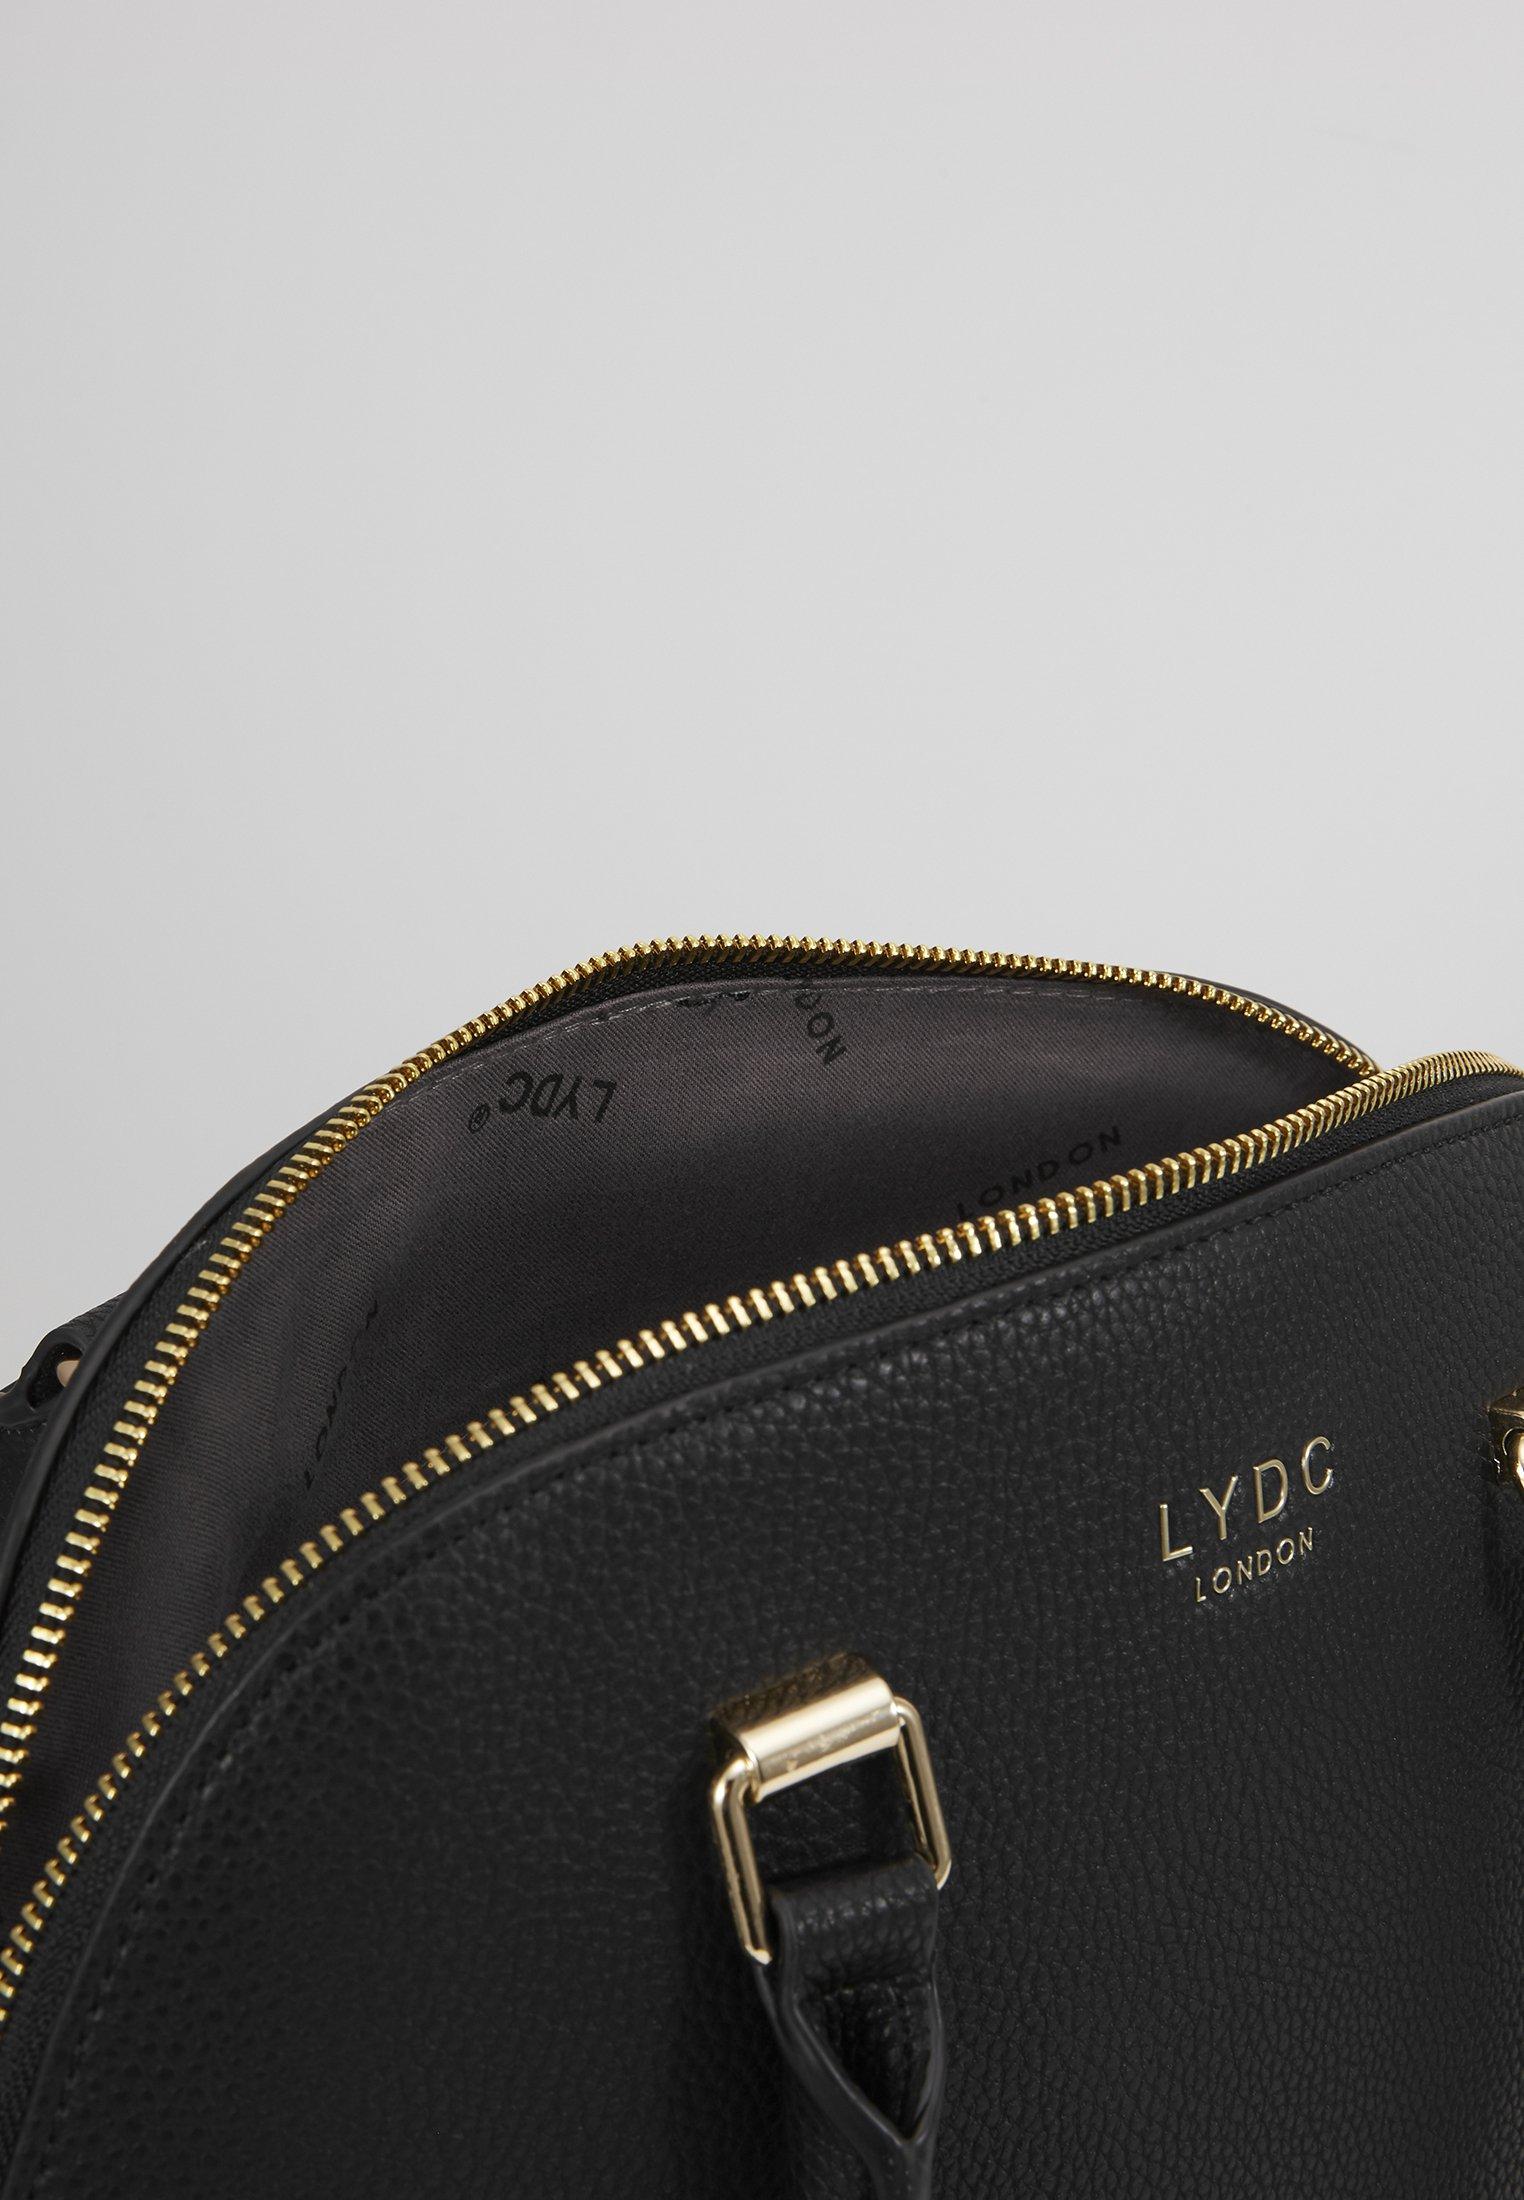 LYDC London Håndveske - black/svart Yo8ClSJtjQR4DaH